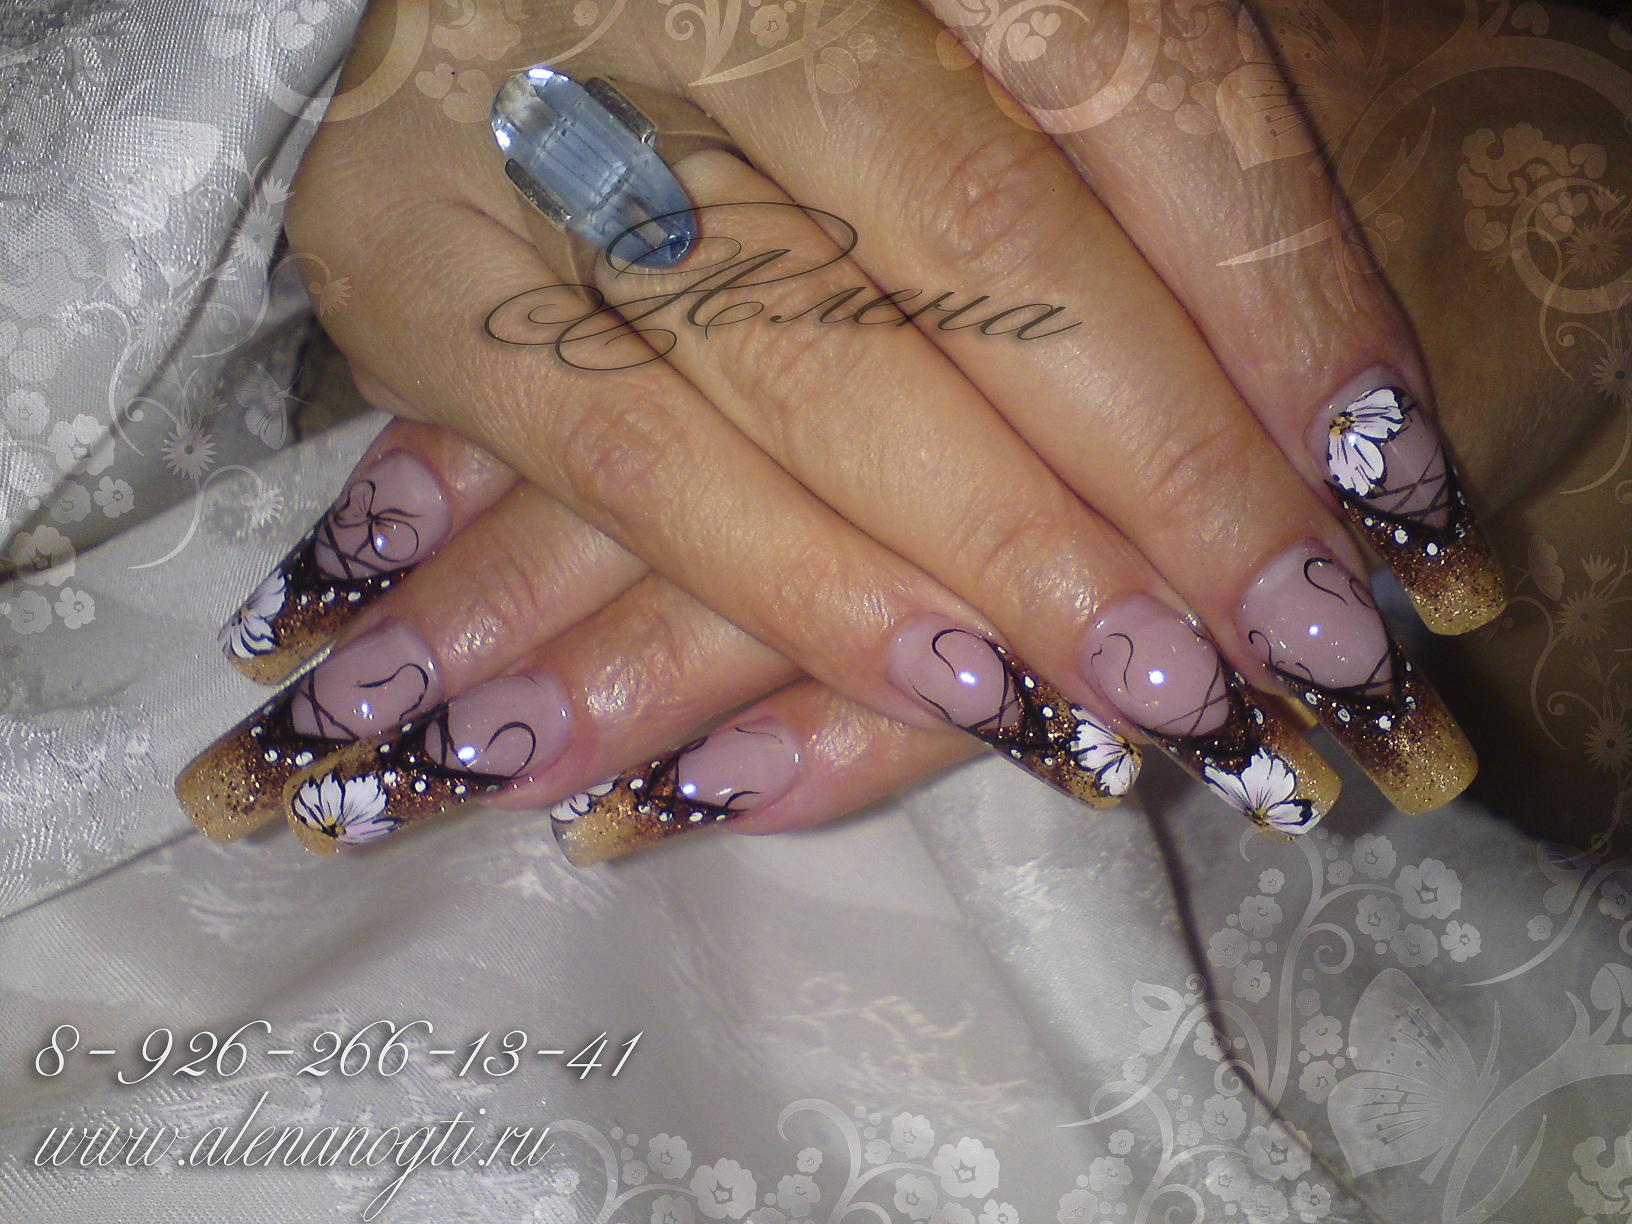 Рисунки ногтей аквариум френч фото